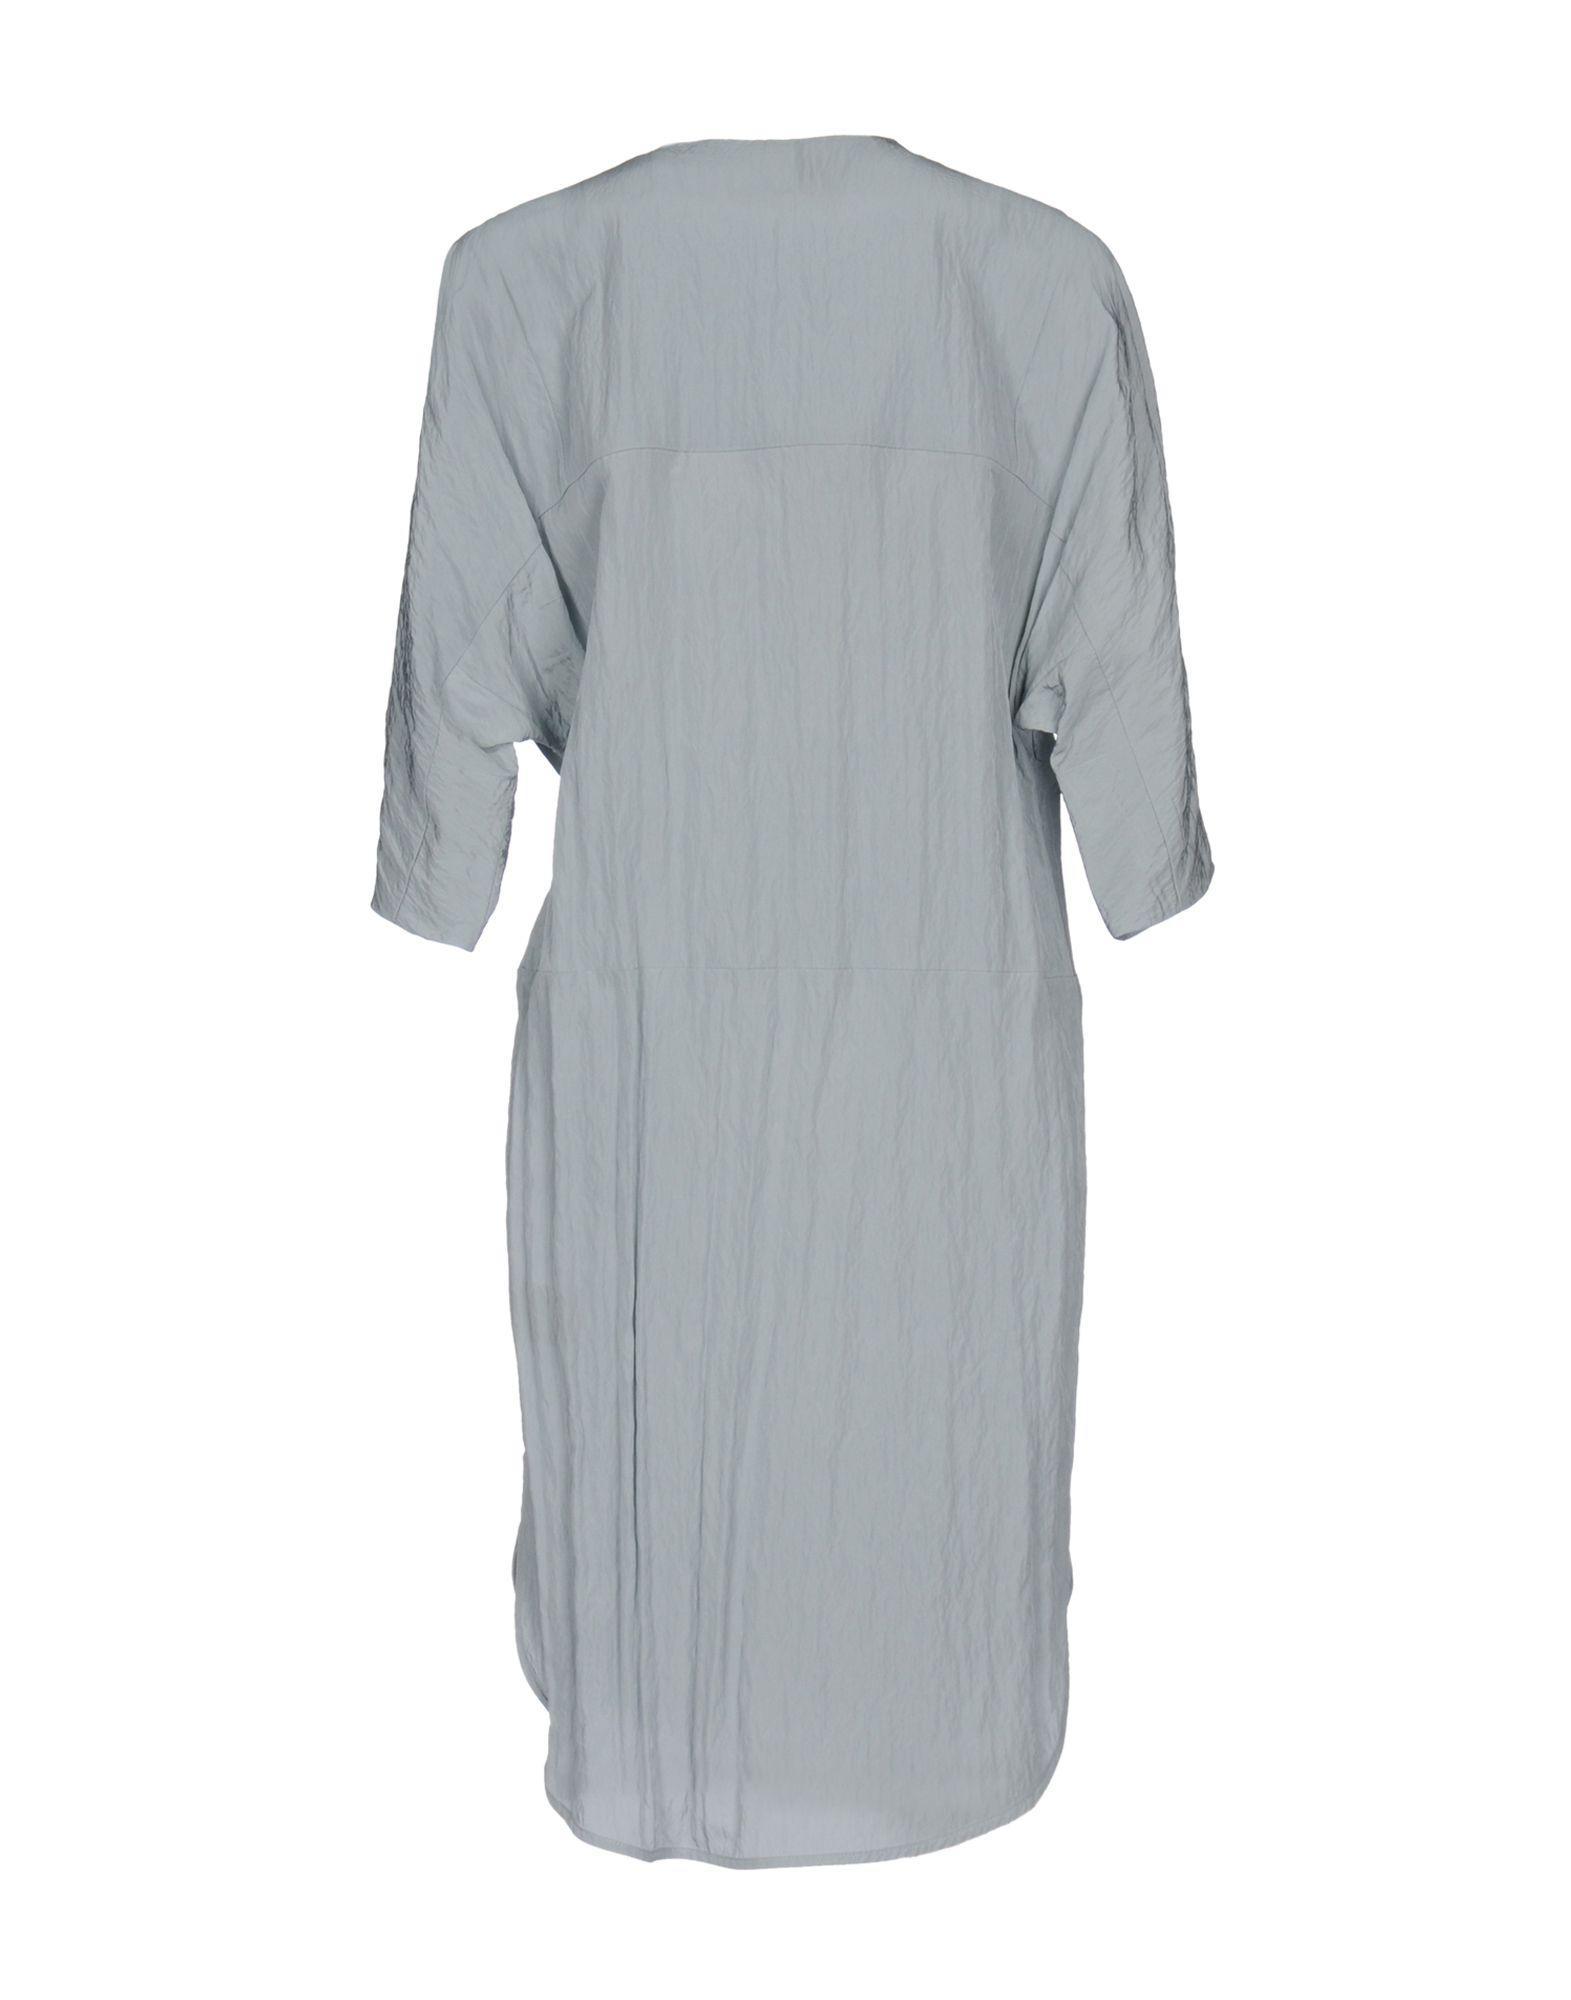 DRESSES - Short dresses Christian Wijnants ct96a8O